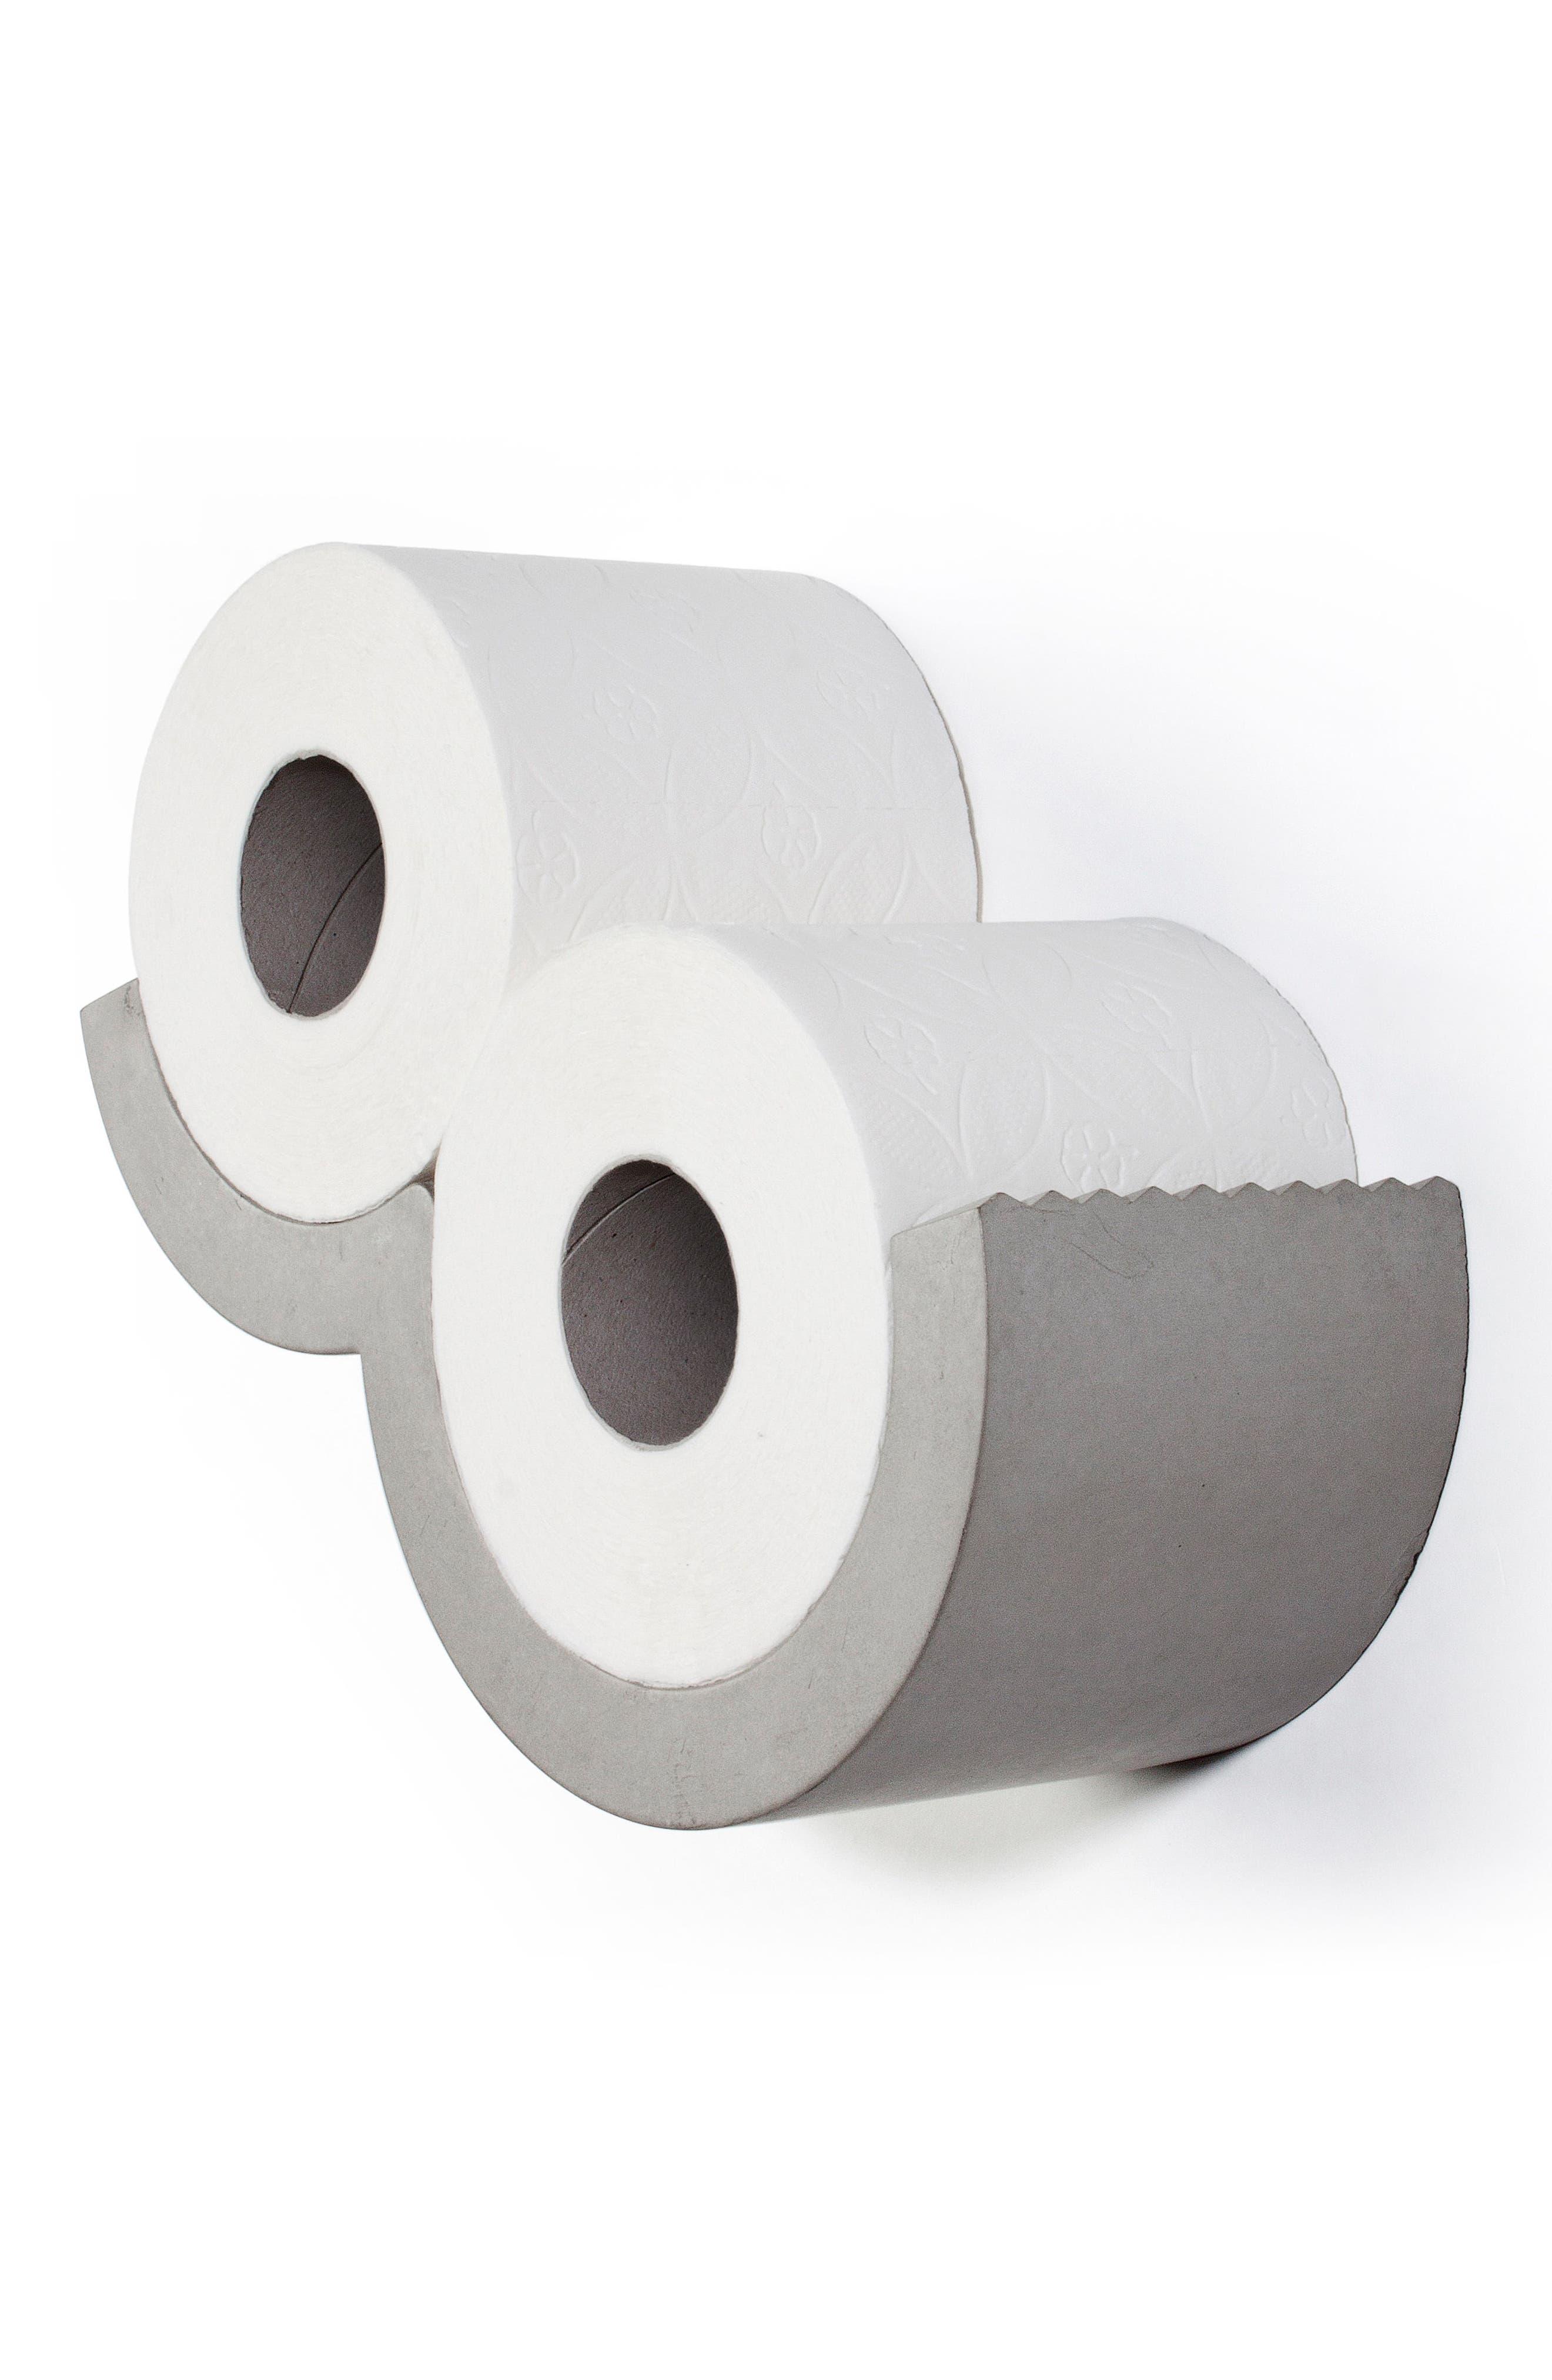 Lyon Béton Extra Small Cloud Toilet Paper Holder,                             Alternate thumbnail 4, color,                             CEMENT